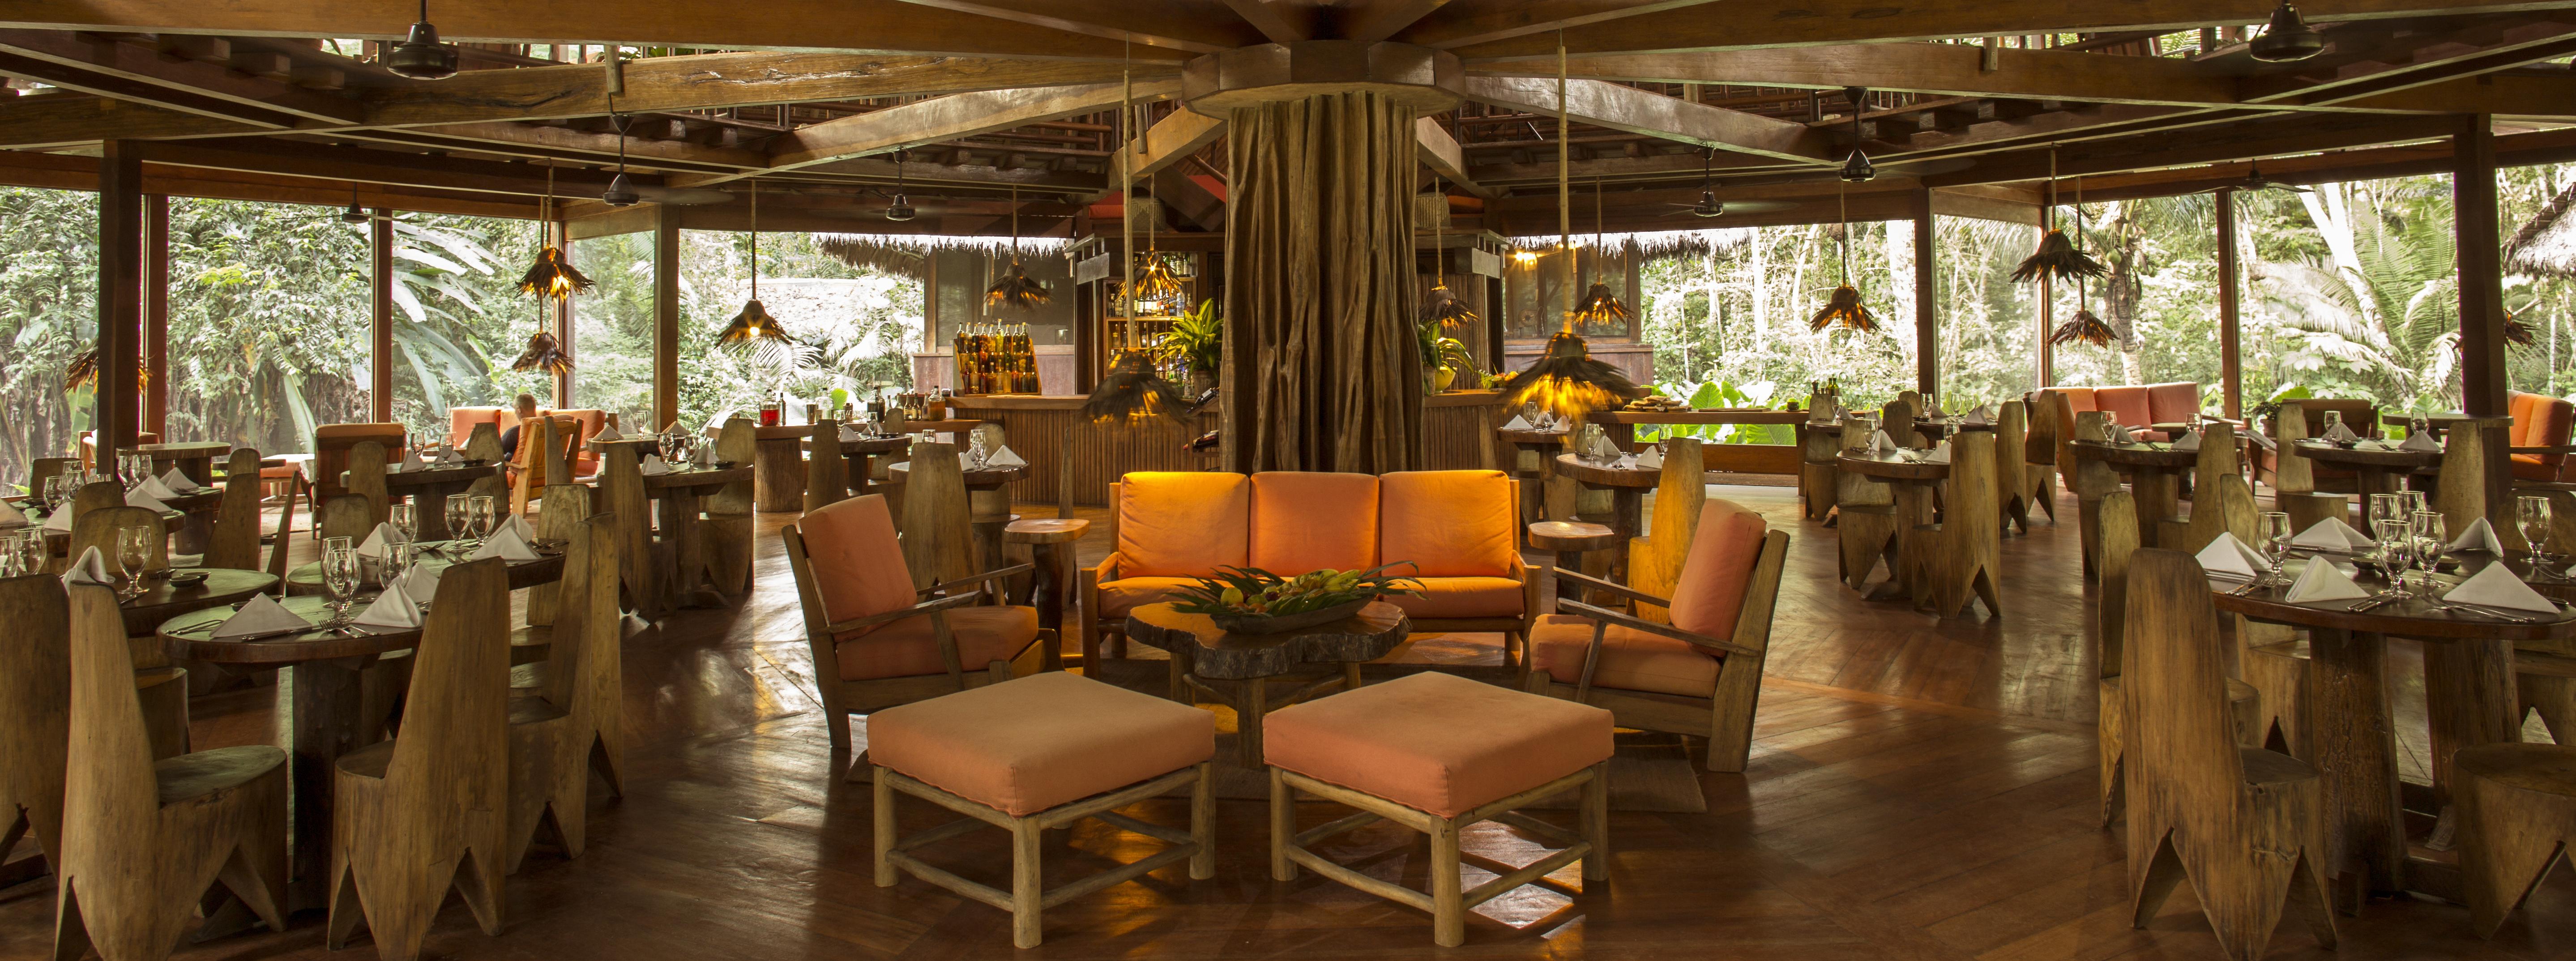 Inkaterra-Reserva-Amazonica-dining